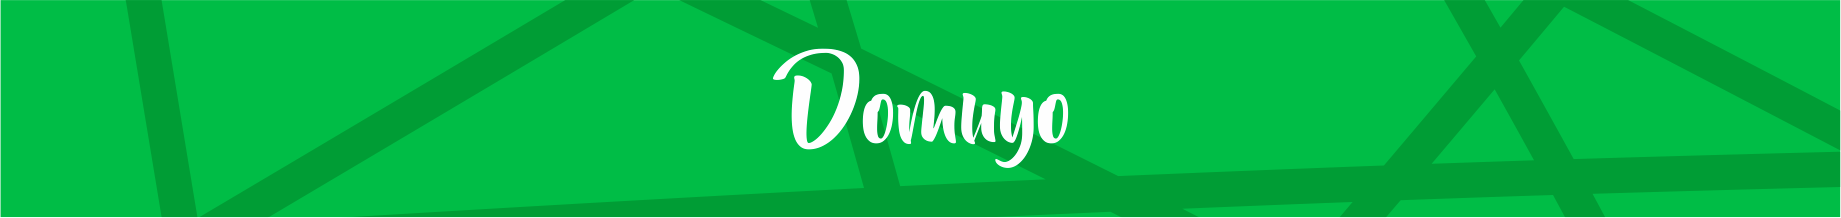 Domuyo